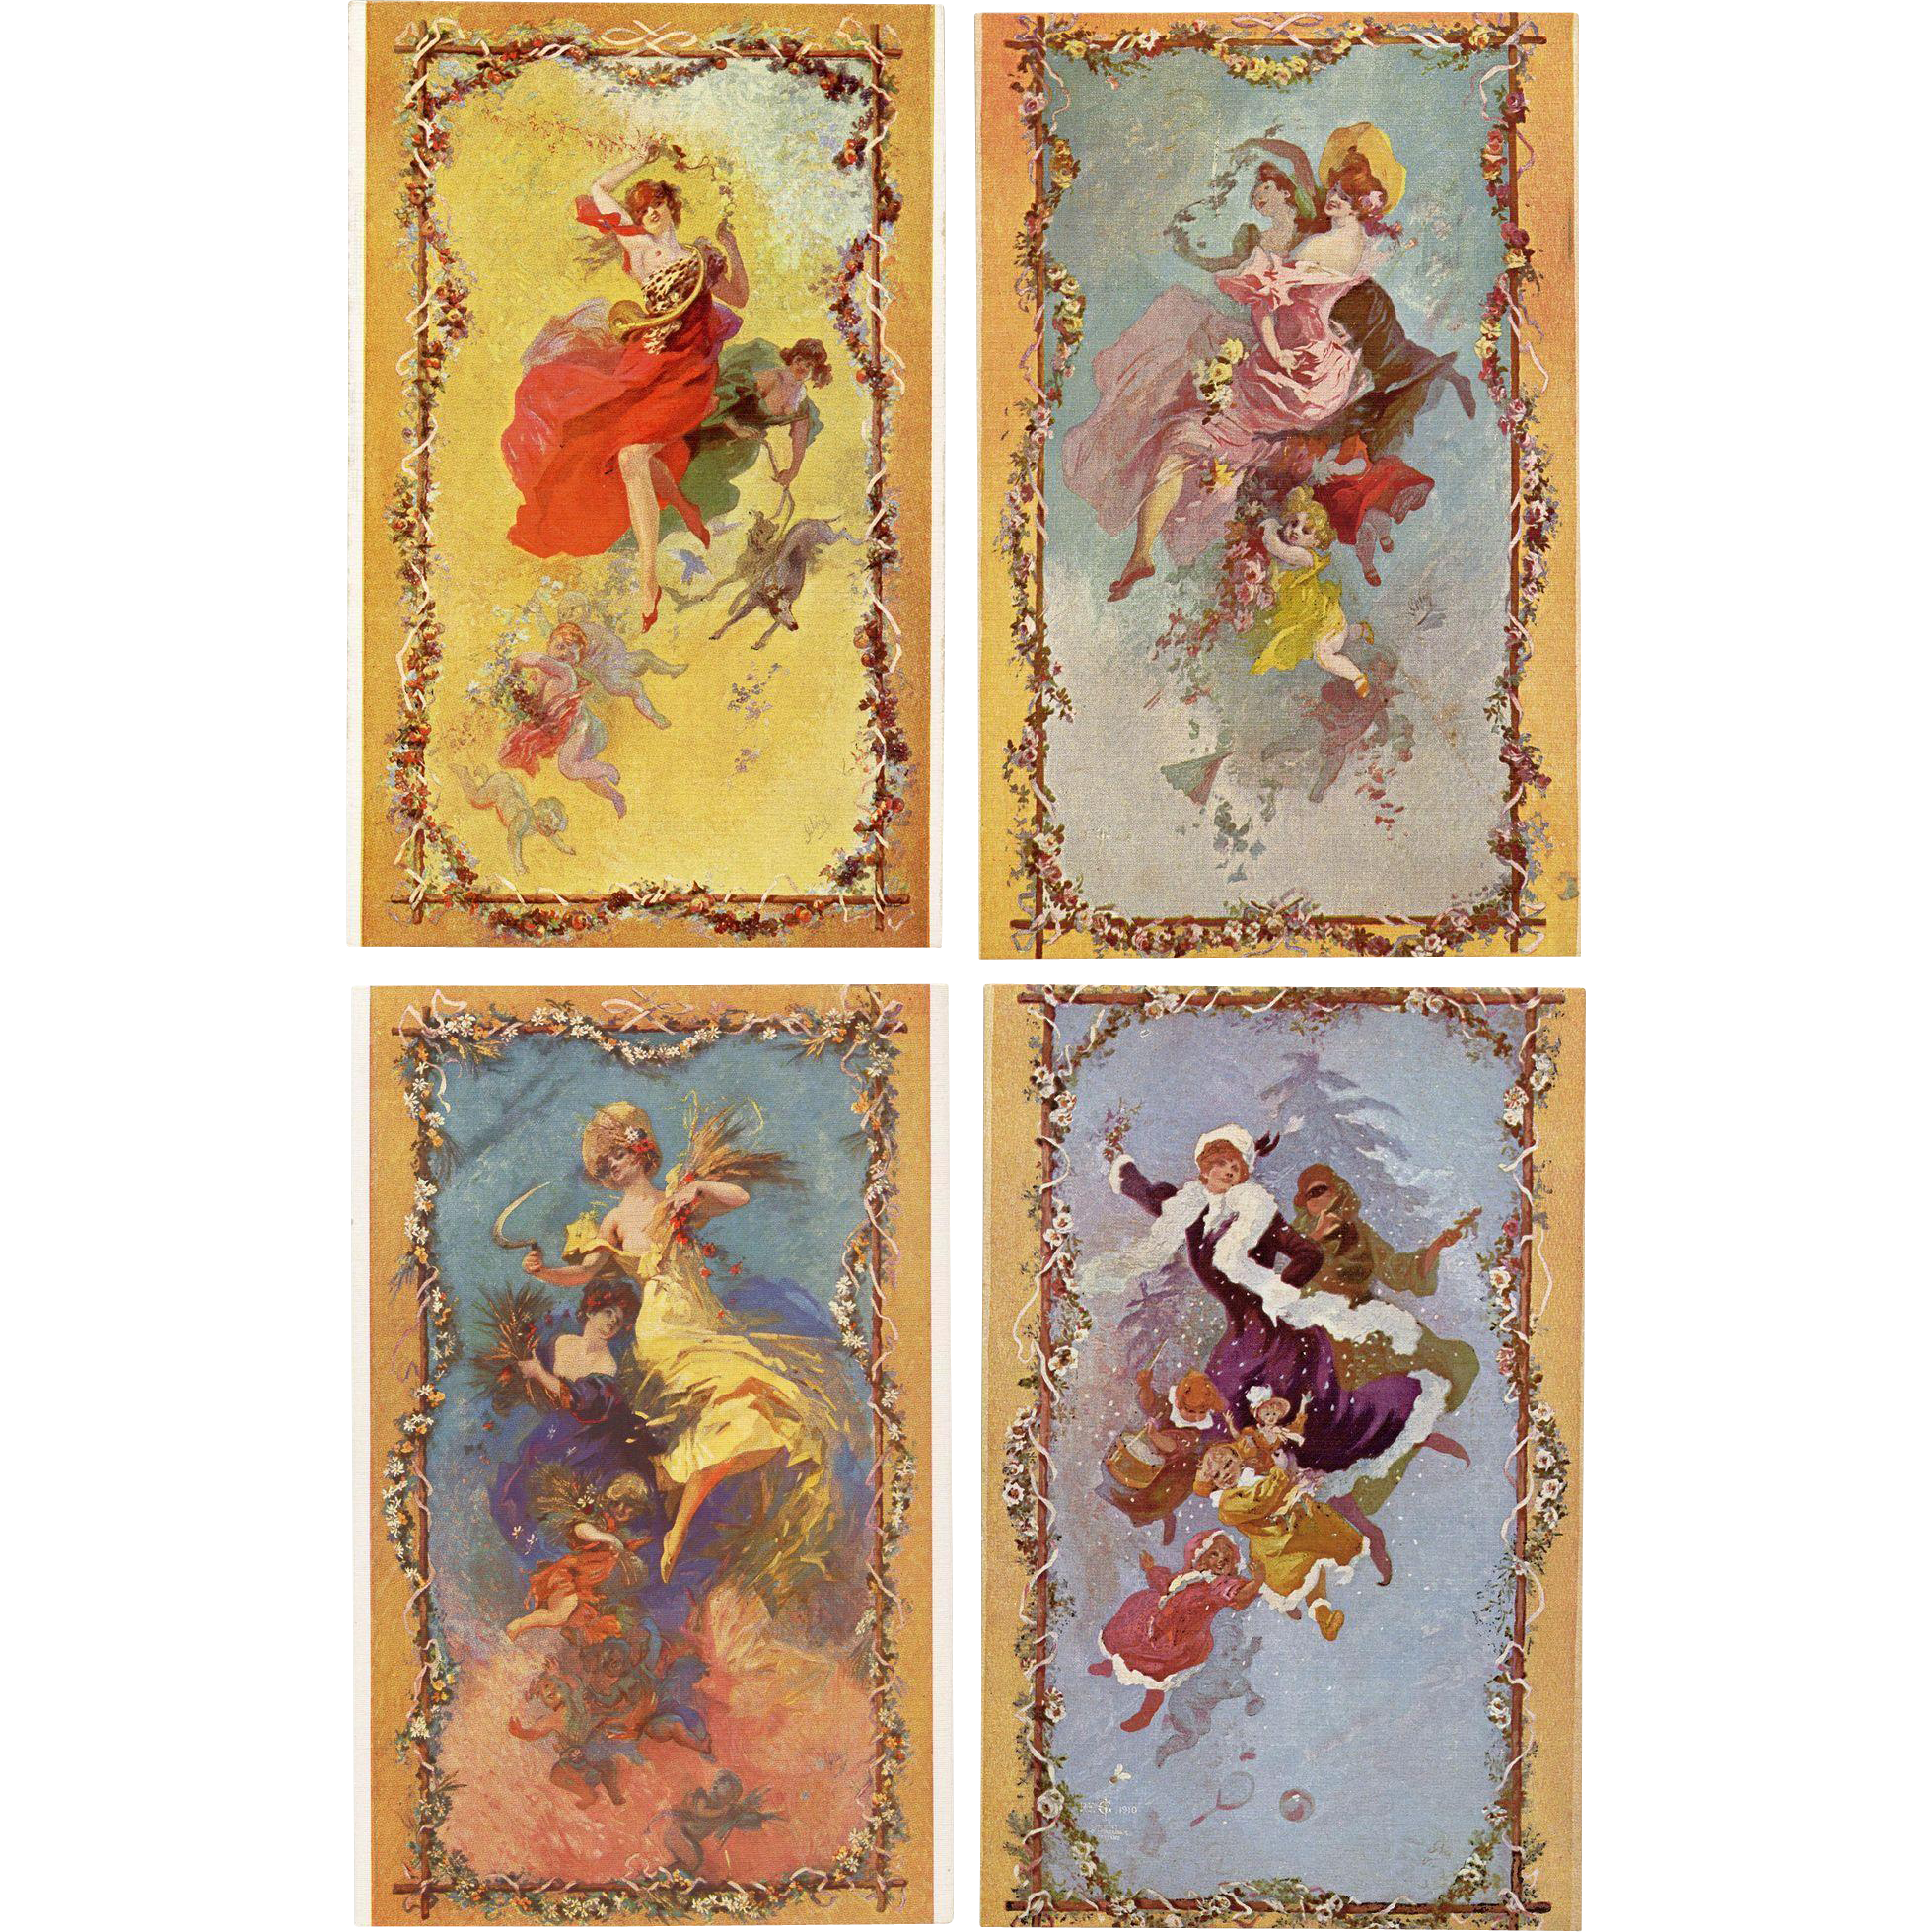 Art Nouveau Jules Cheret Four Seasons Tapestry Designs for Gobelins Unused Postcards